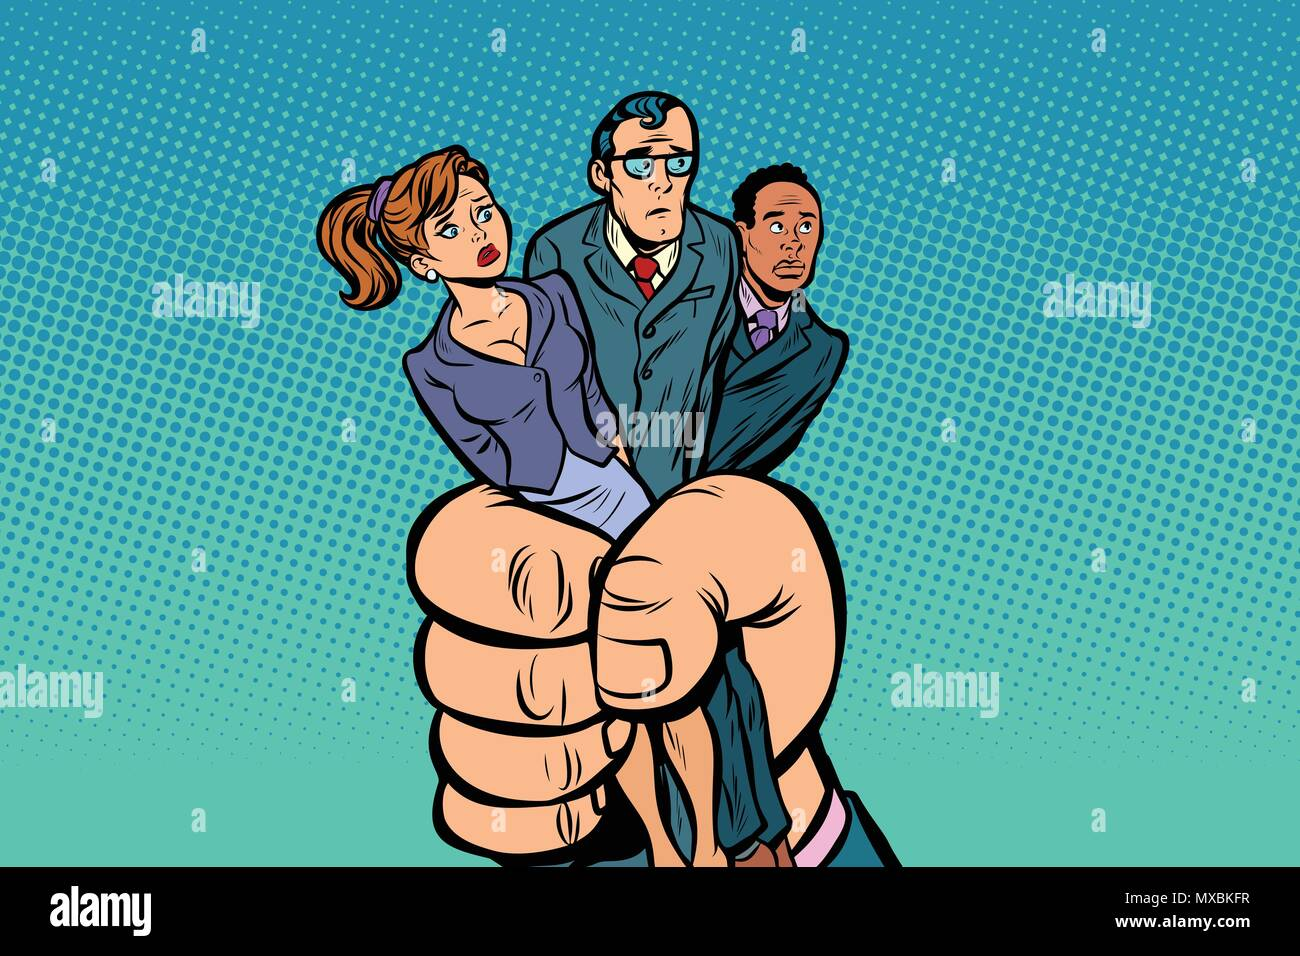 People prisoners in the giant fist. Comic book cartoon pop art retro illustration Stock Vector